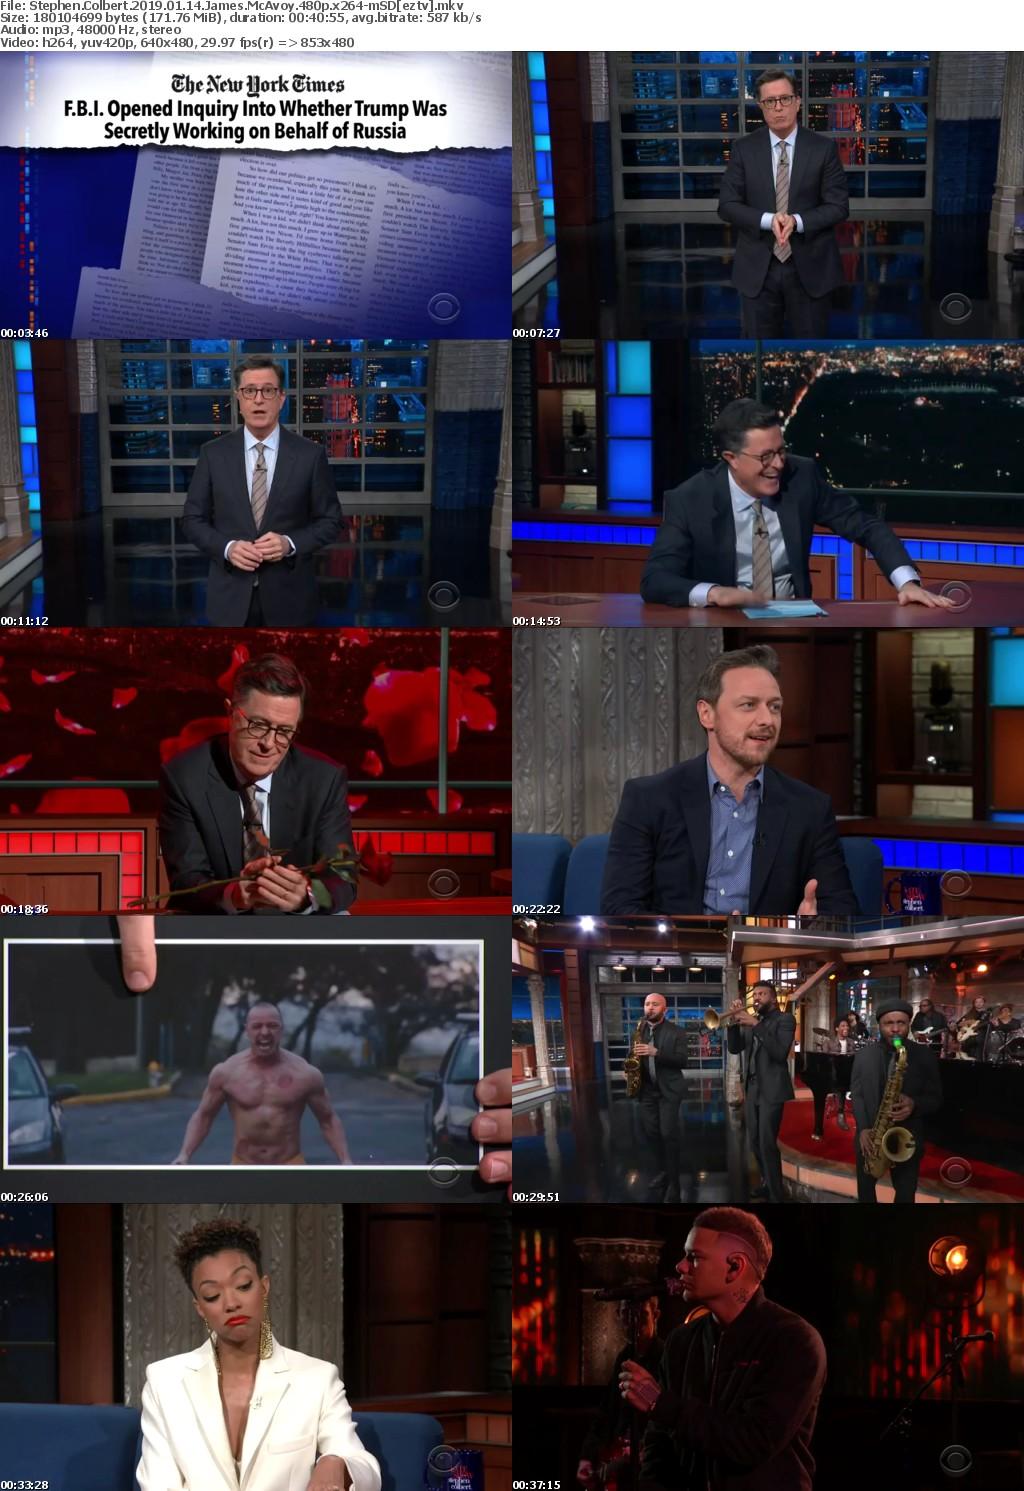 Stephen Colbert (2019) 01 14 James McAvoy 480p x264-mSD